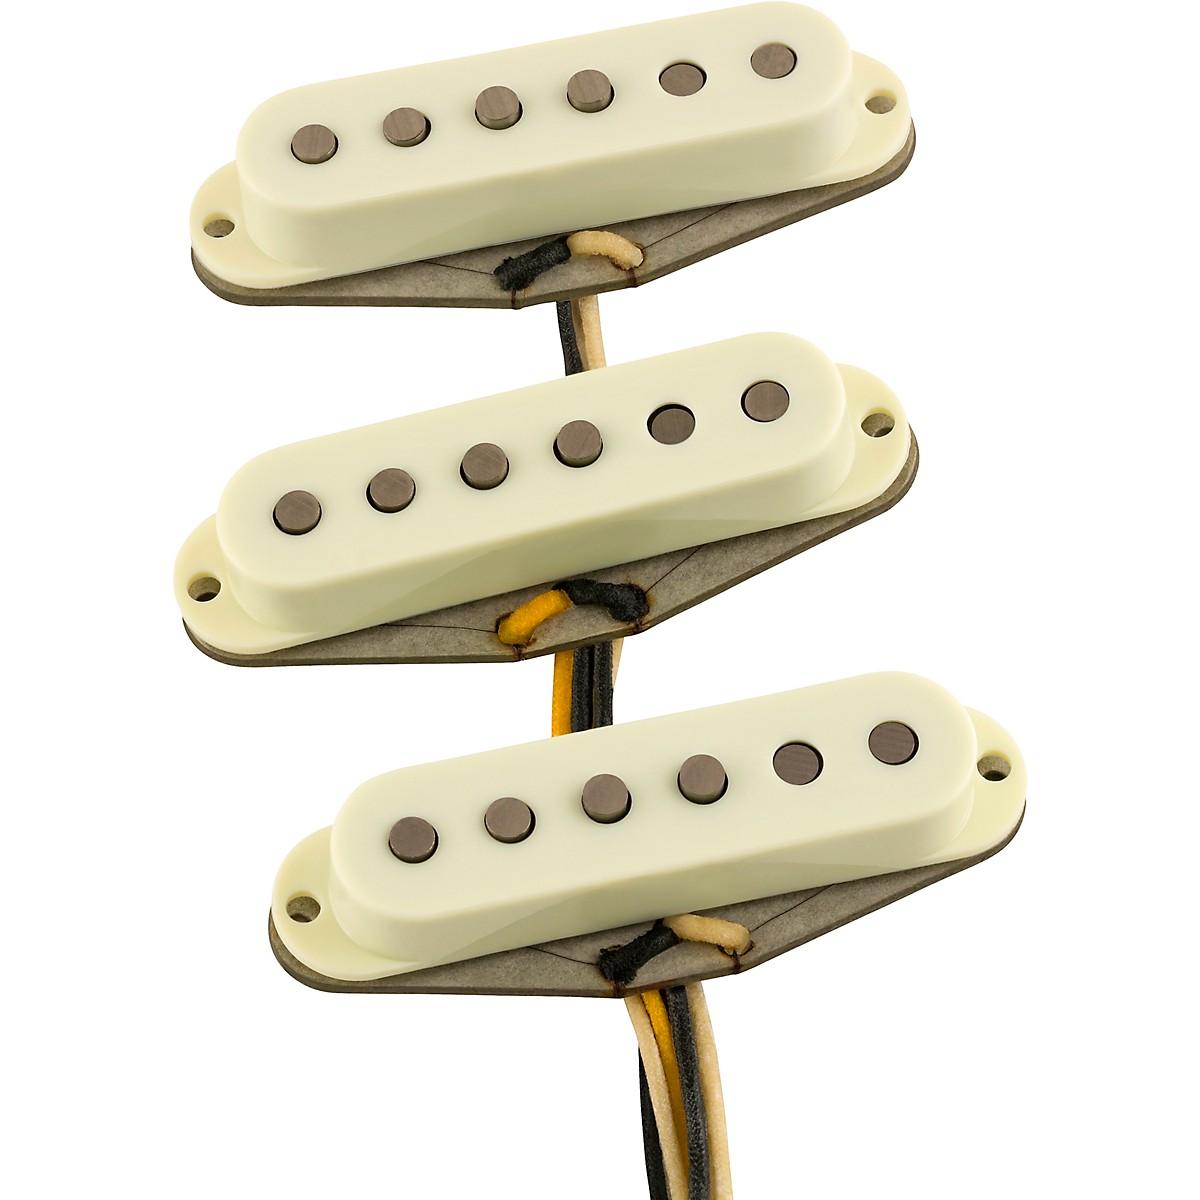 Fender Custom Shop Josefina Hand-Wound Custom '69 Stratocaster Pickup Set